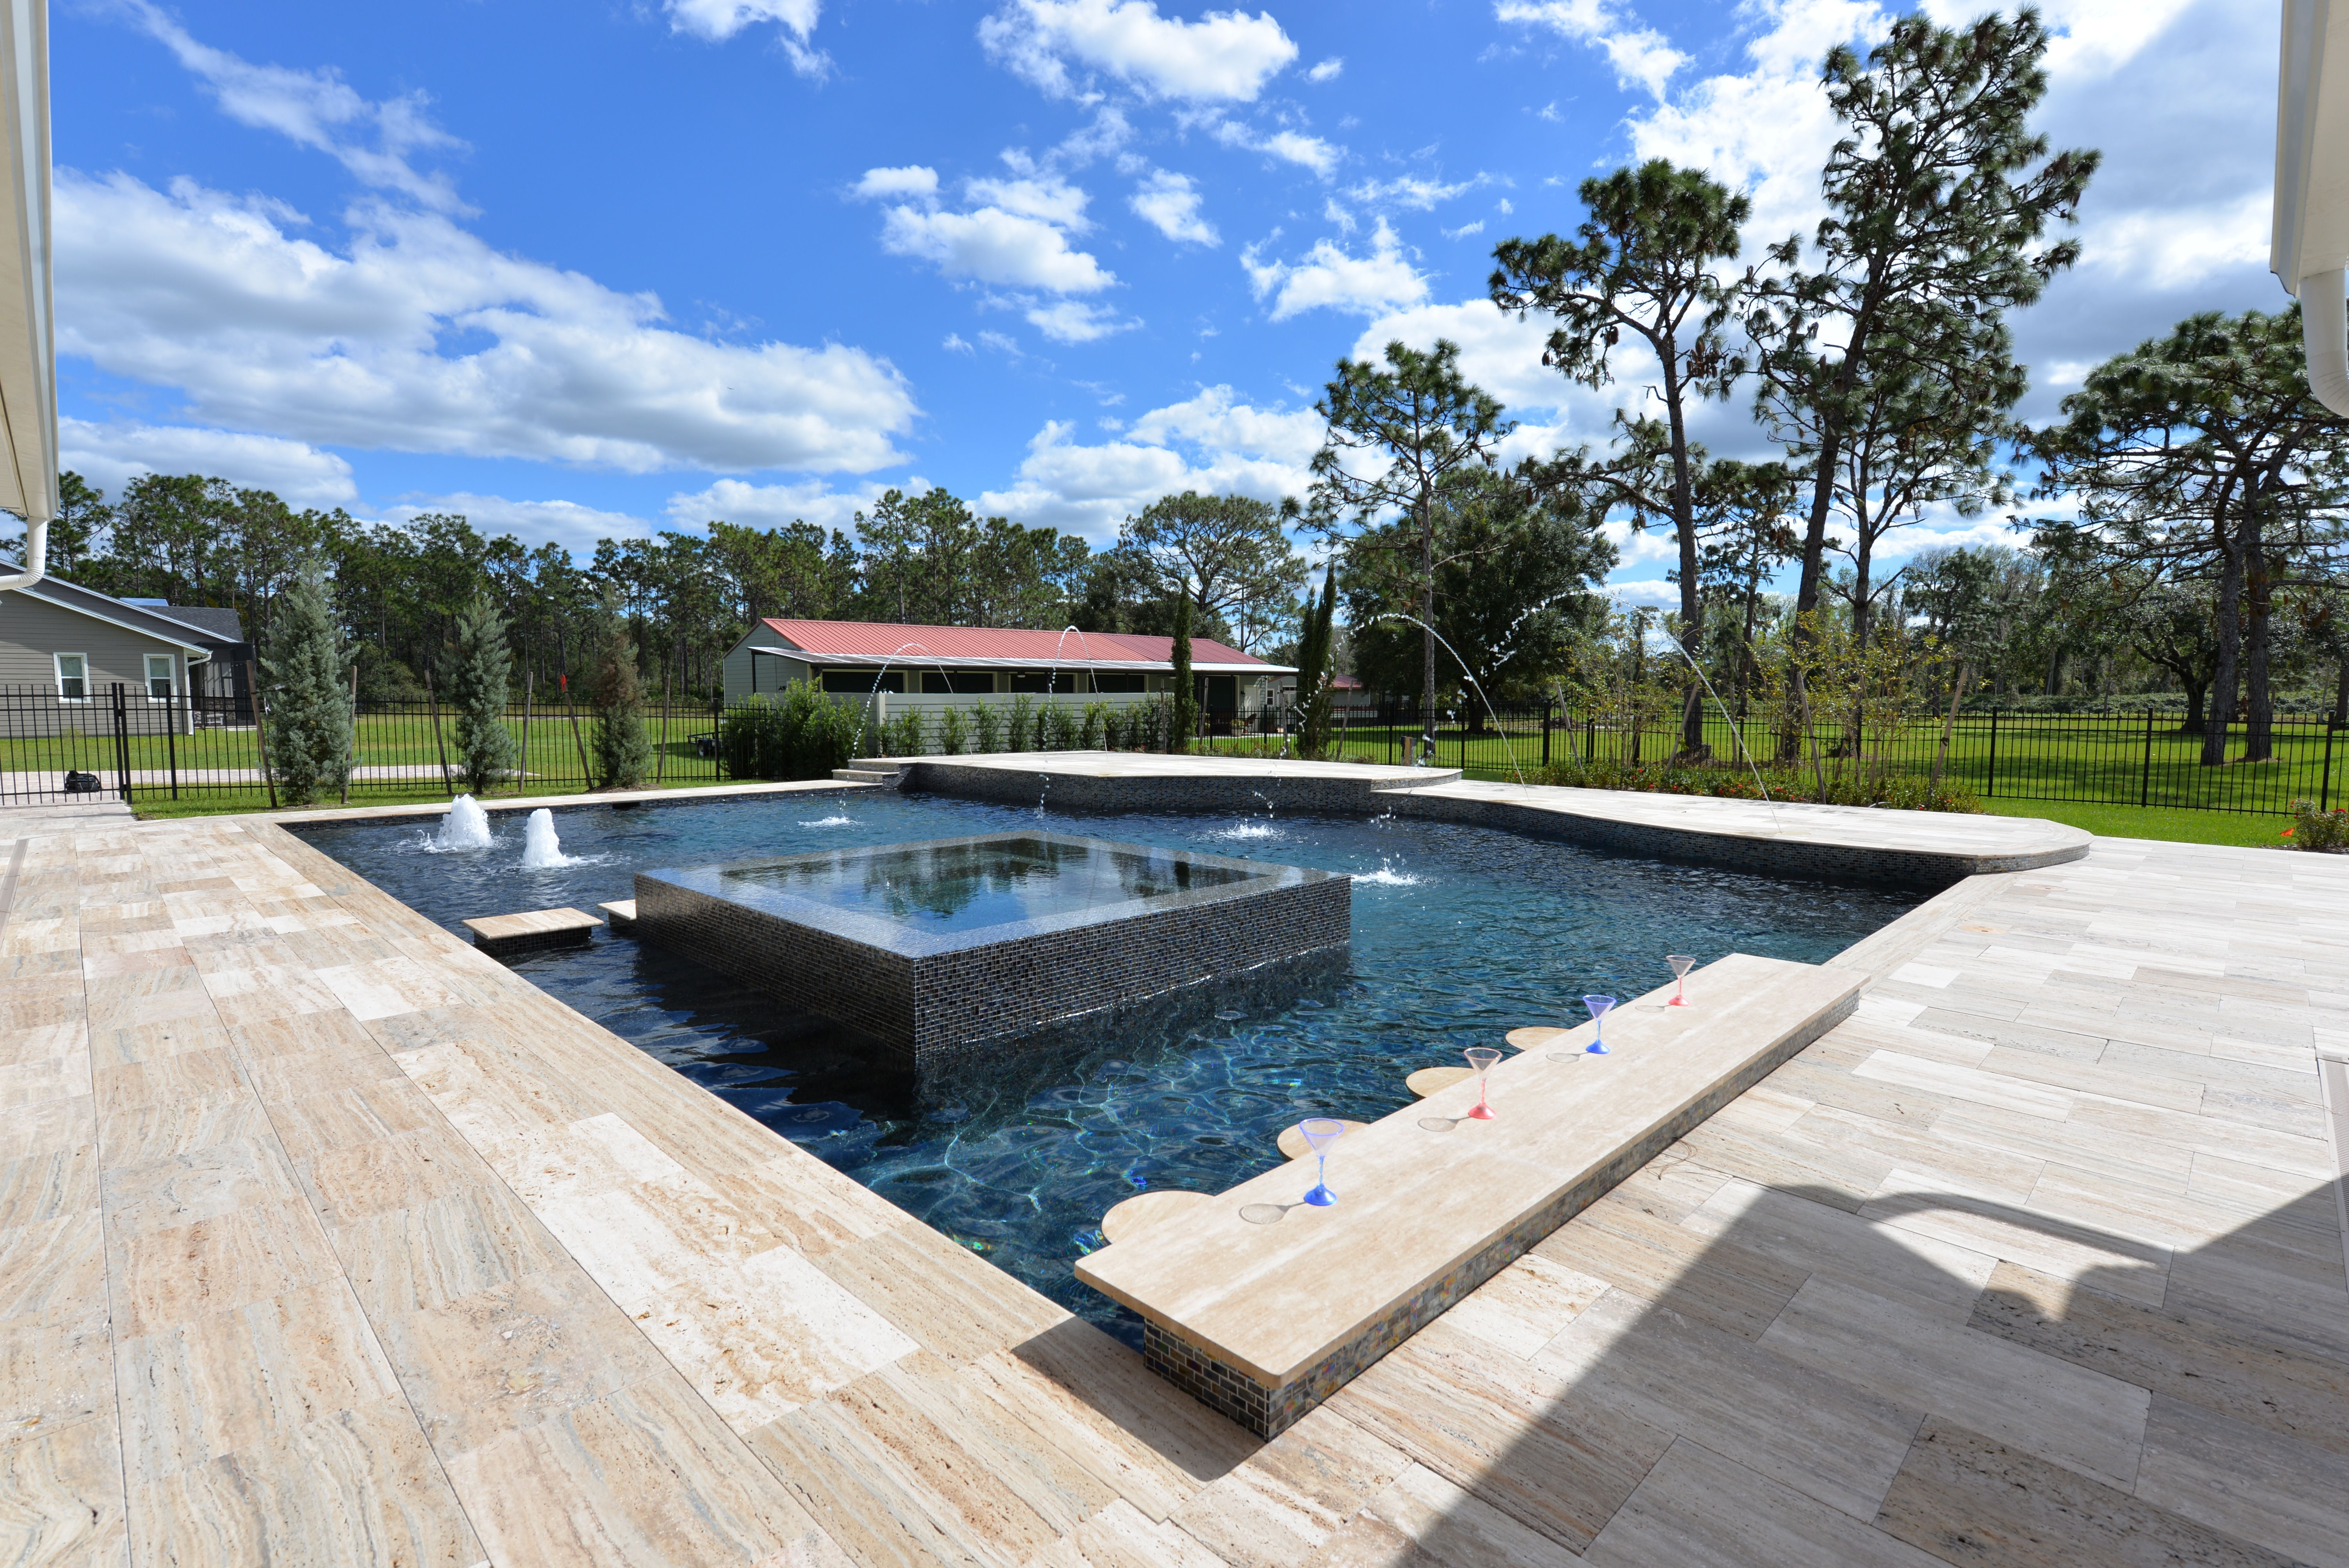 Surprising An Expansive Pool Built In Orlando Florida This Pool Has Download Free Architecture Designs Pushbritishbridgeorg